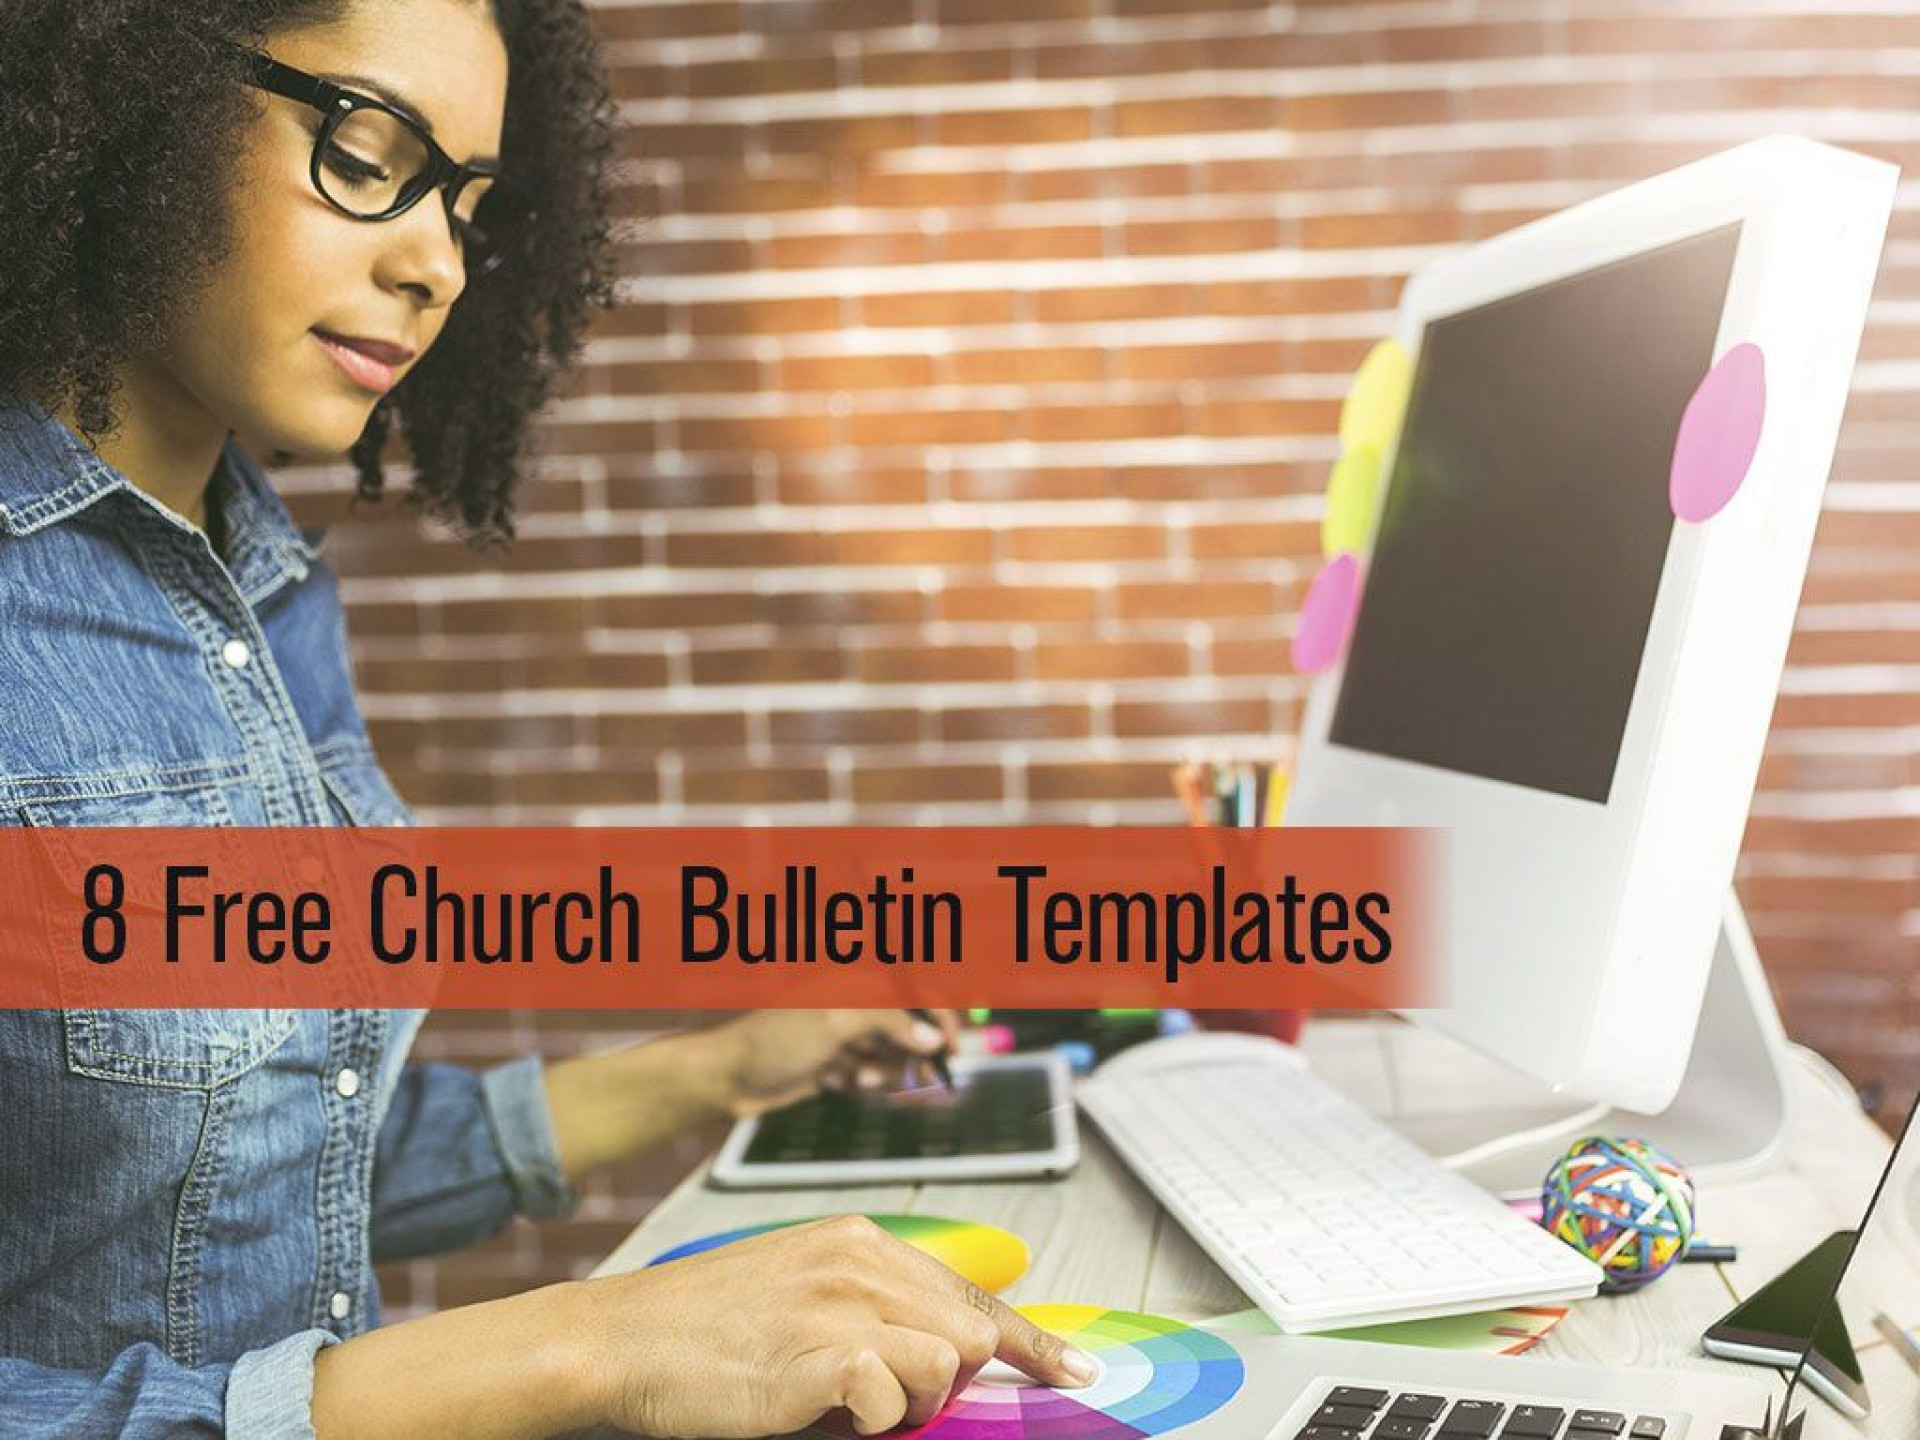 002 Outstanding Free Church Program Template Microsoft Publisher Inspiration 1920